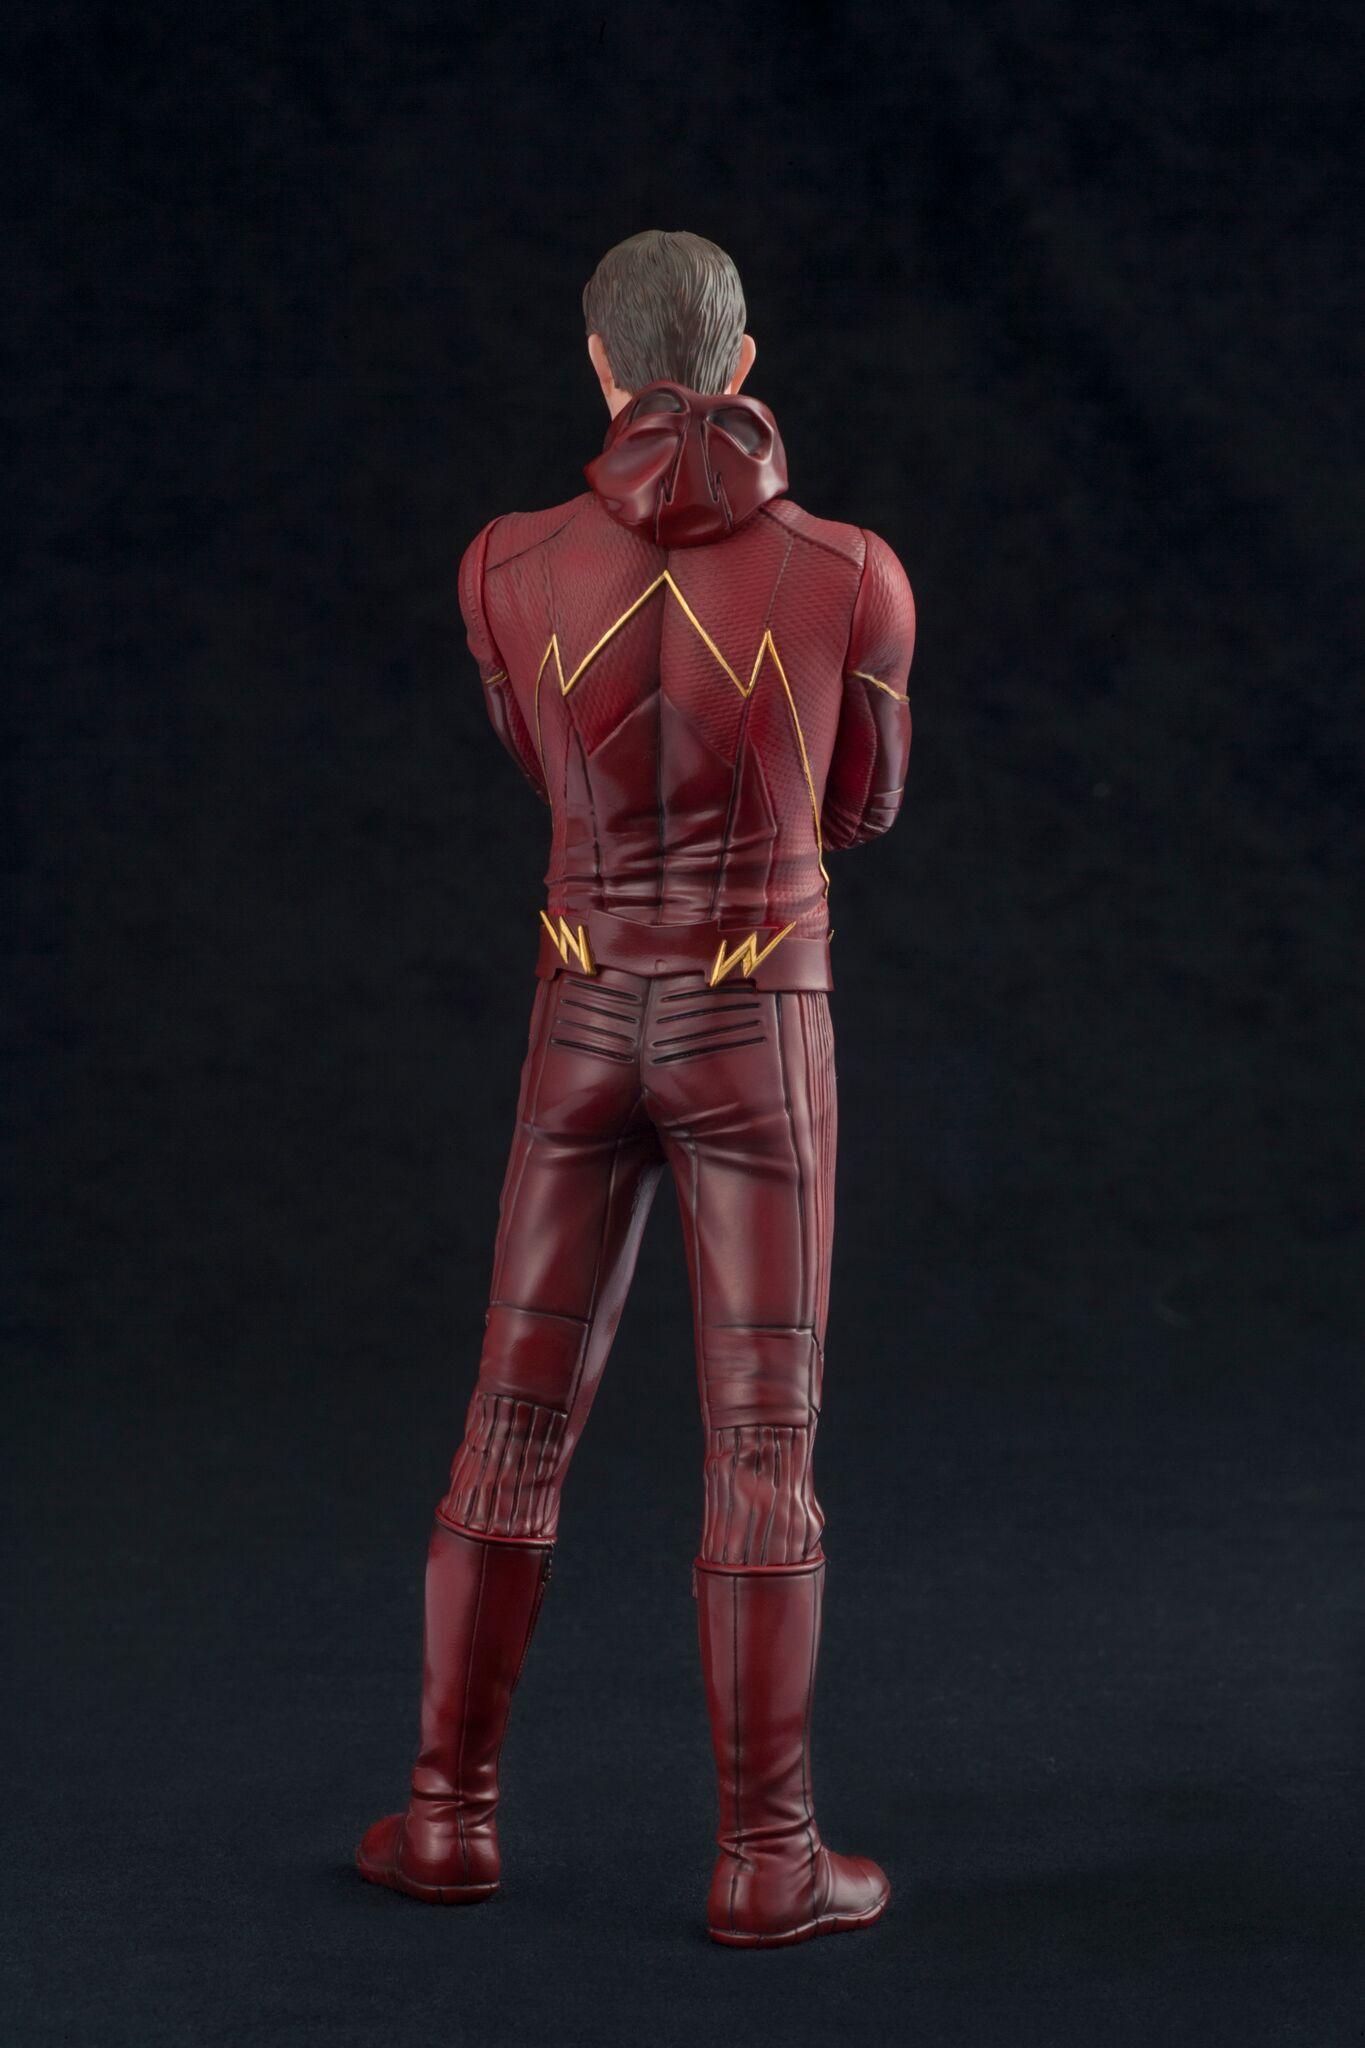 Barry Allen The Flash Figure